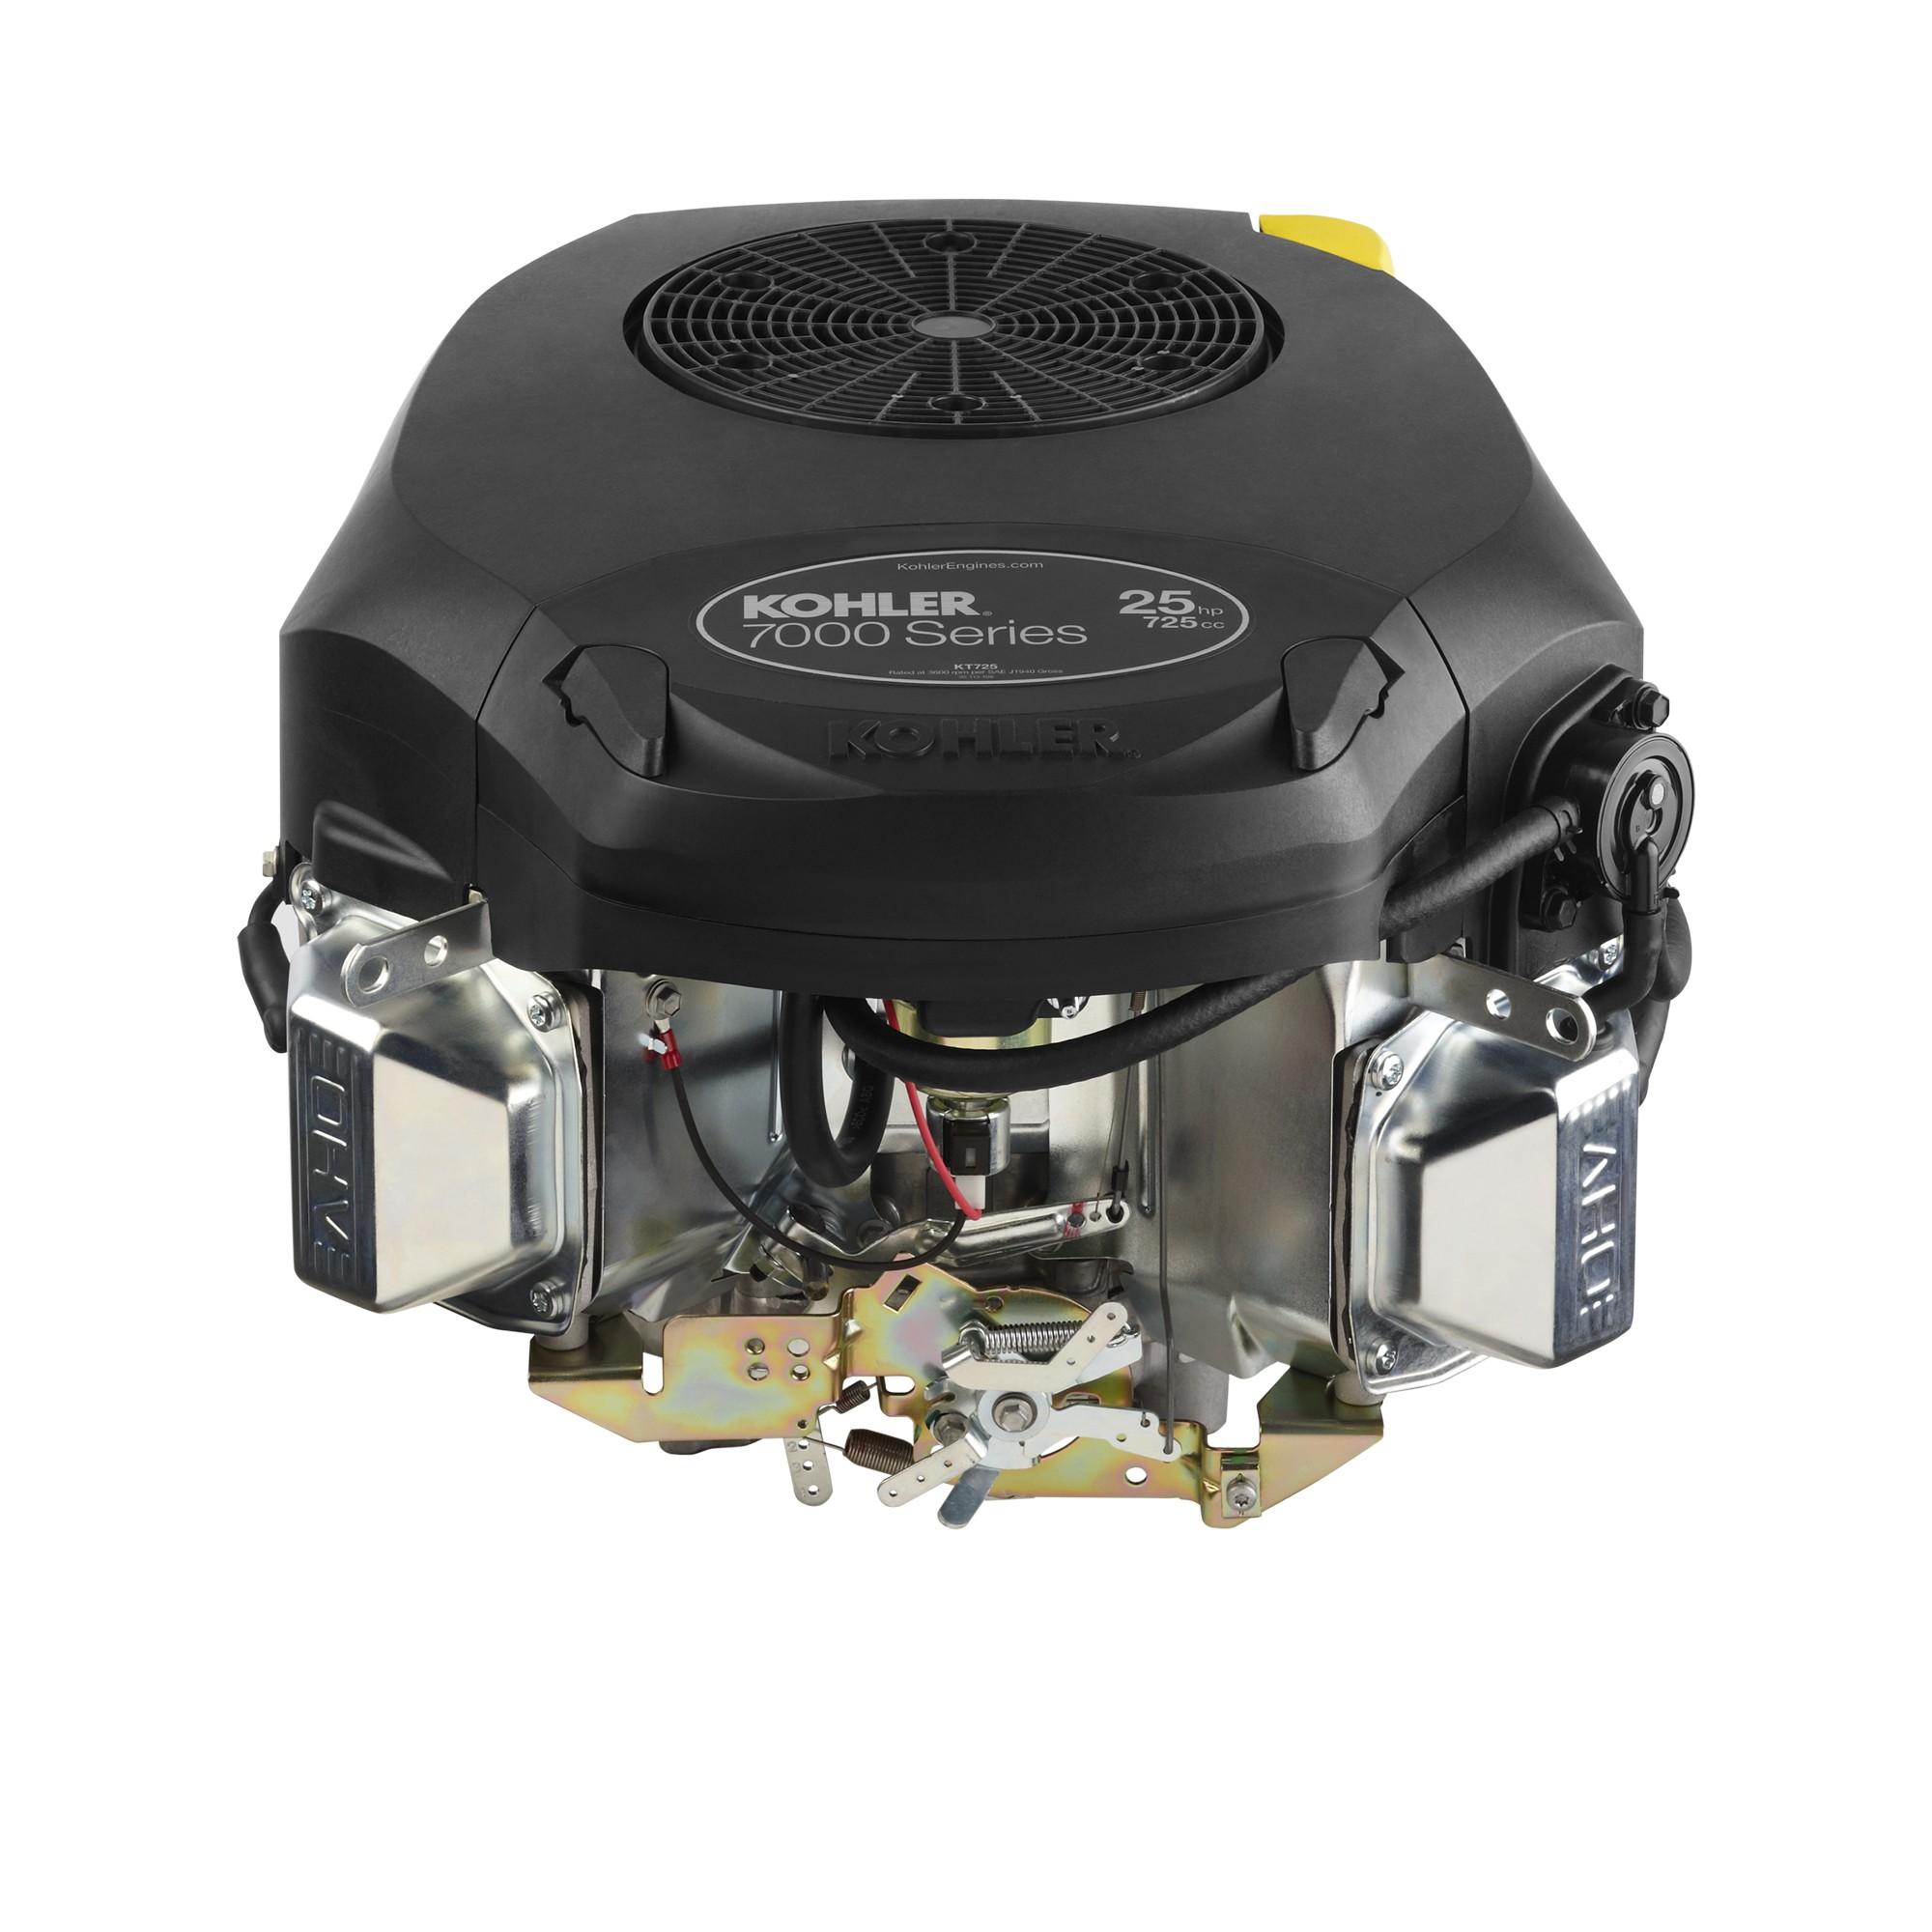 hight resolution of kohler engines kt735 7000 series product detail engines kohler marine generator wiring diagram kohler 7000 generator wiring diagram